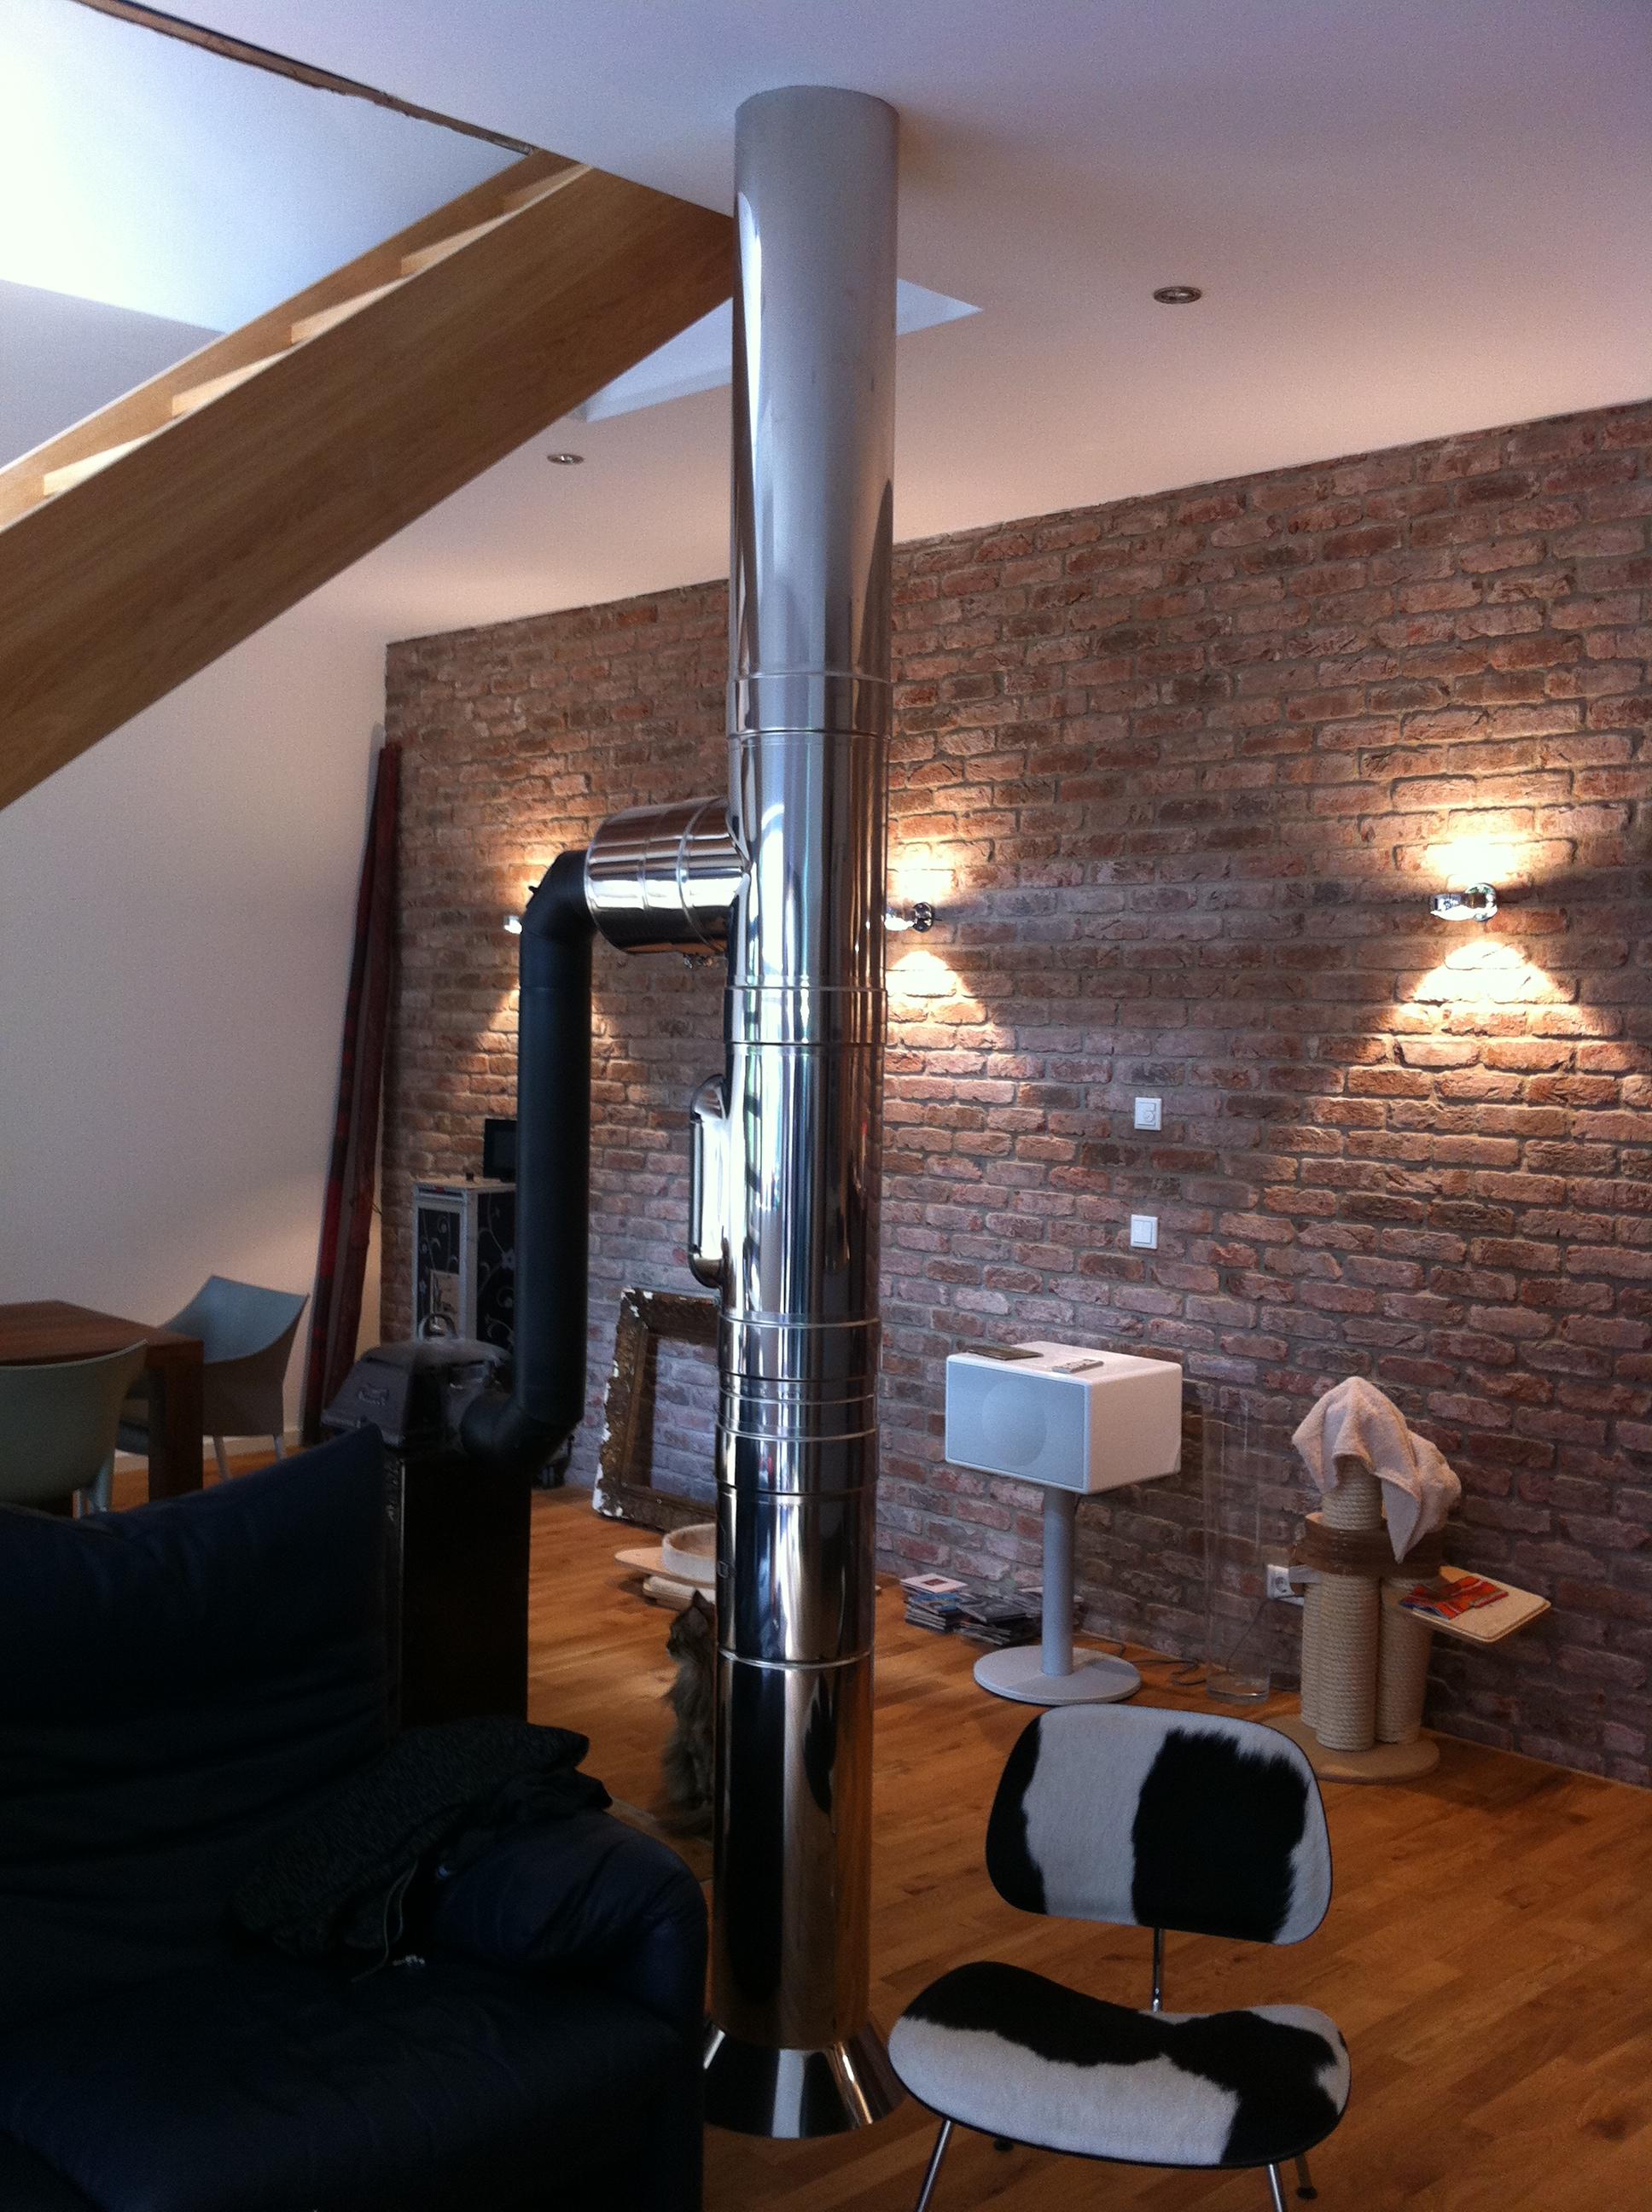 auenkamin edelstahl solarbayer komplettset durchm mm with auenkamin edelstahl stunning. Black Bedroom Furniture Sets. Home Design Ideas